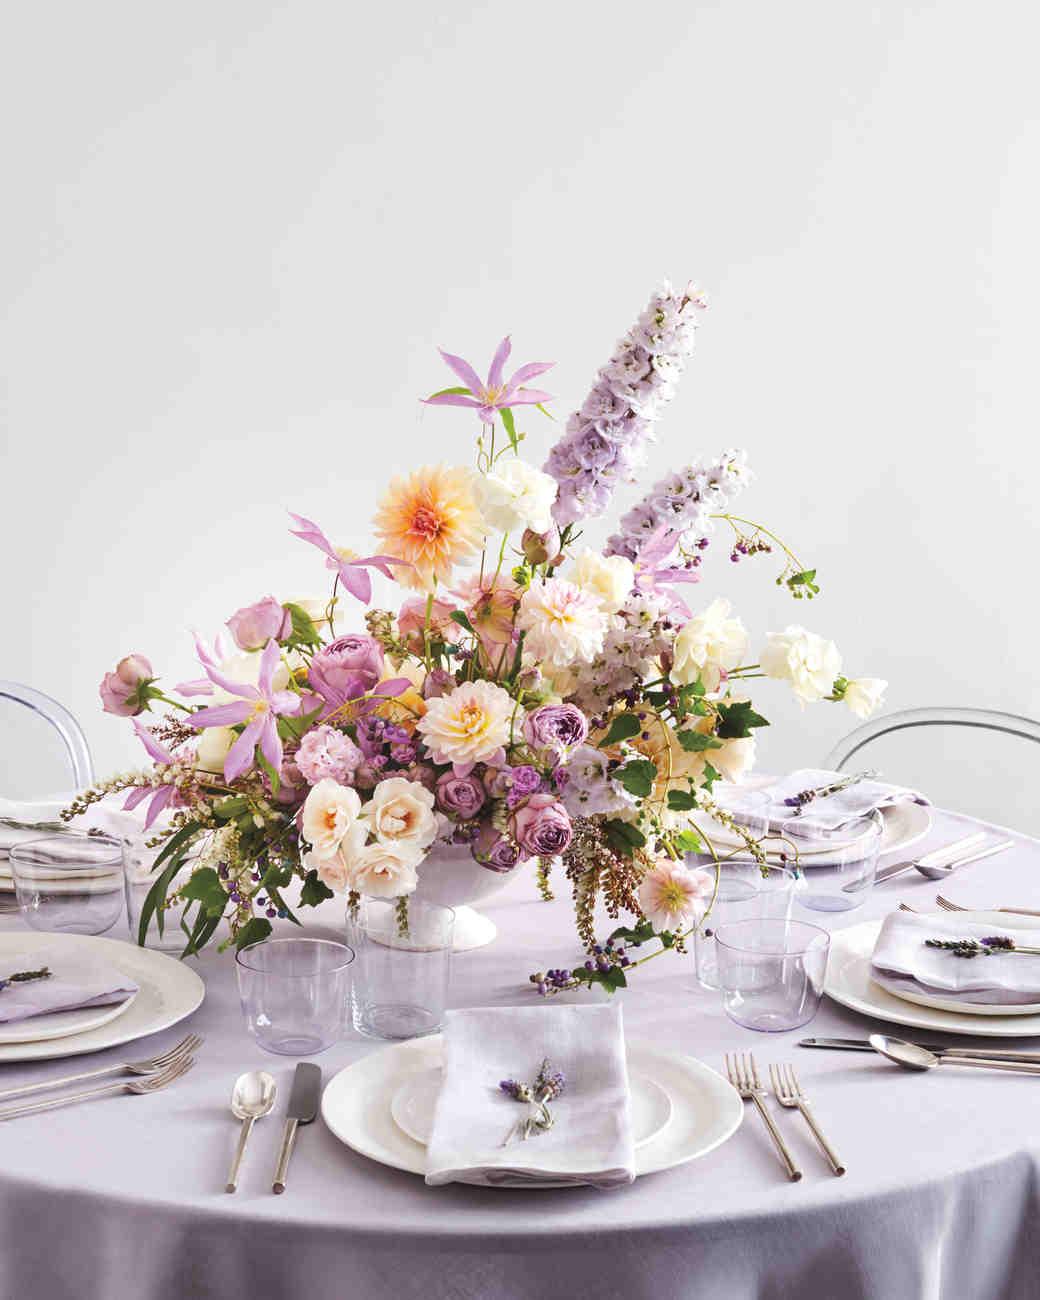 23 diy wedding centerpieces we love martha stewart weddings rh marthastewartweddings com diy wedding centerpieces non floral diy tall wedding floral centerpieces